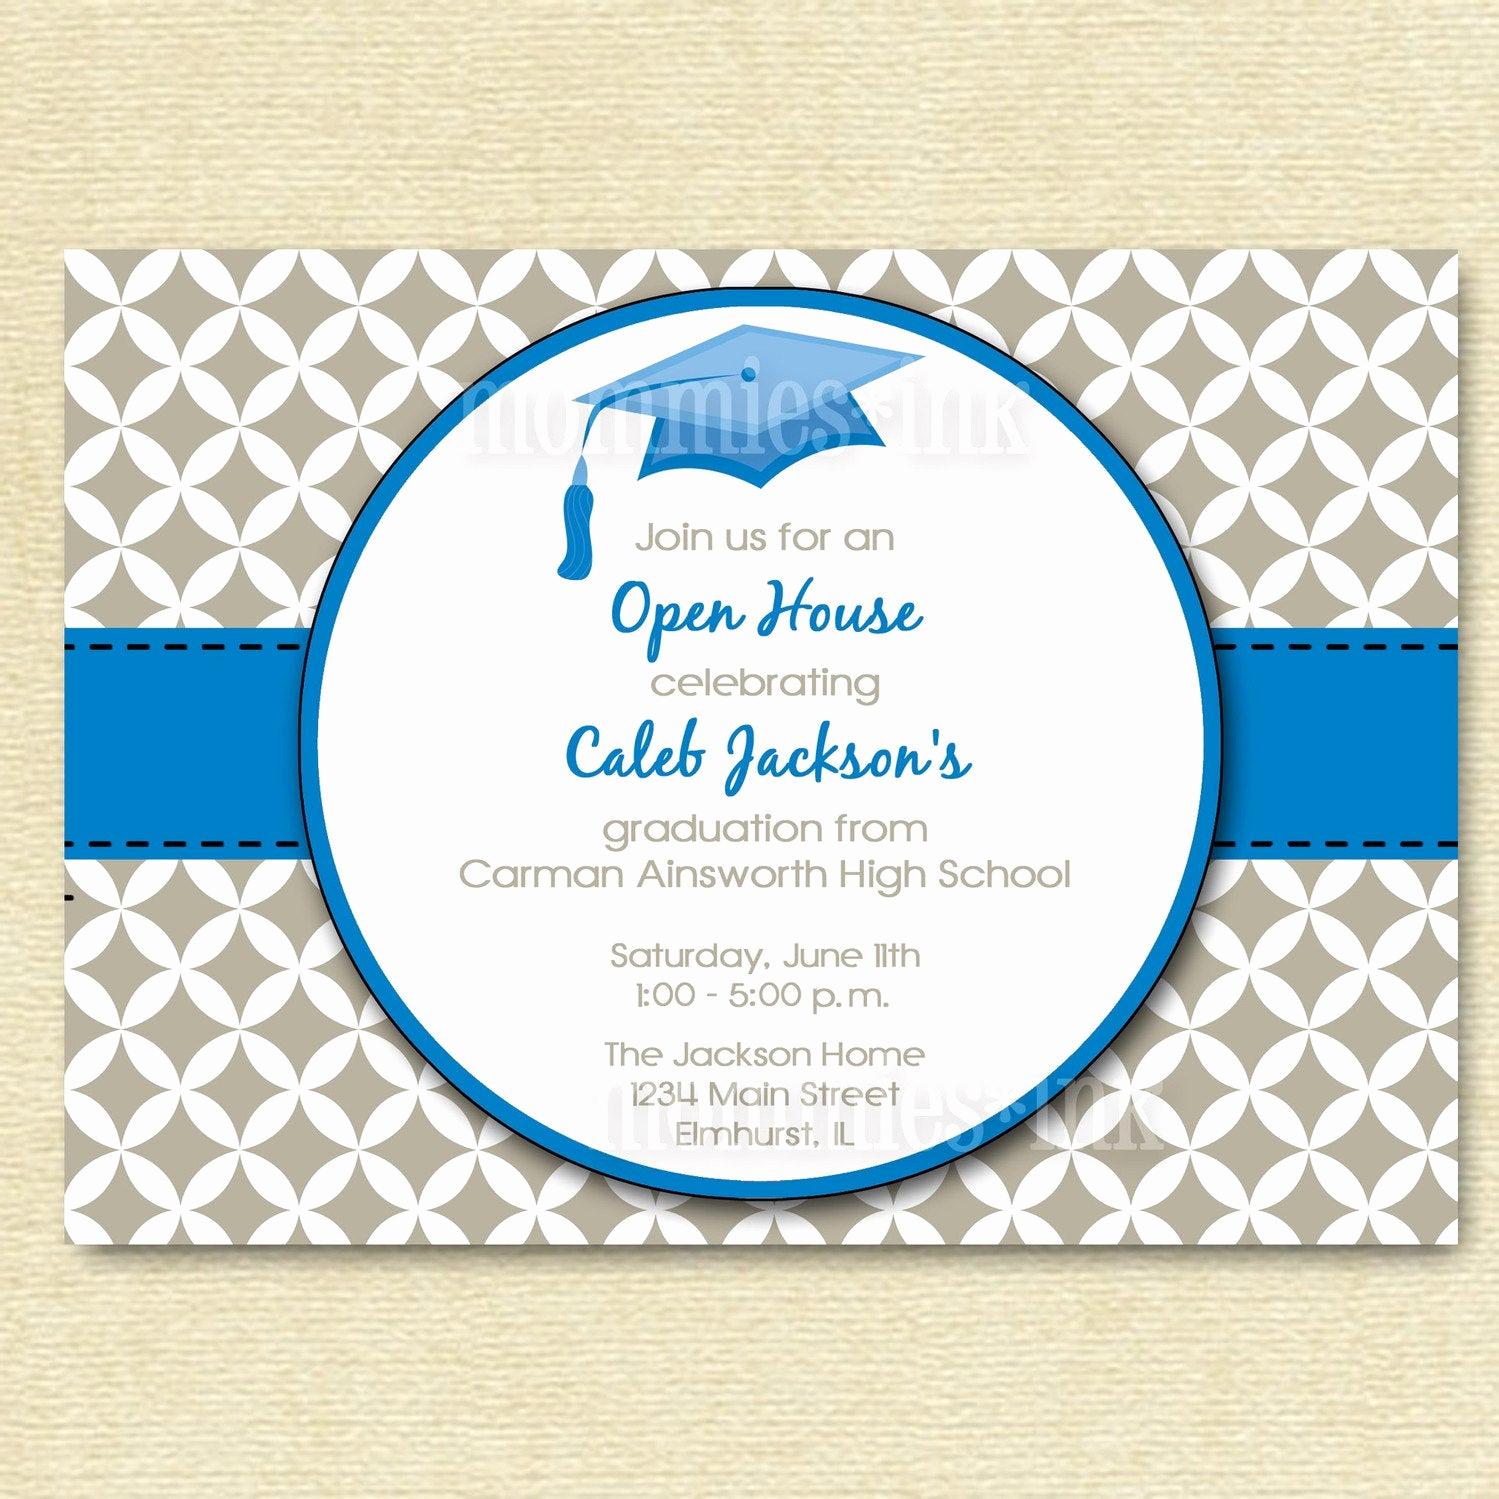 Open House Party Invitation Wording Luxury Graduation Invitation Open House Invitation by Mommiesink